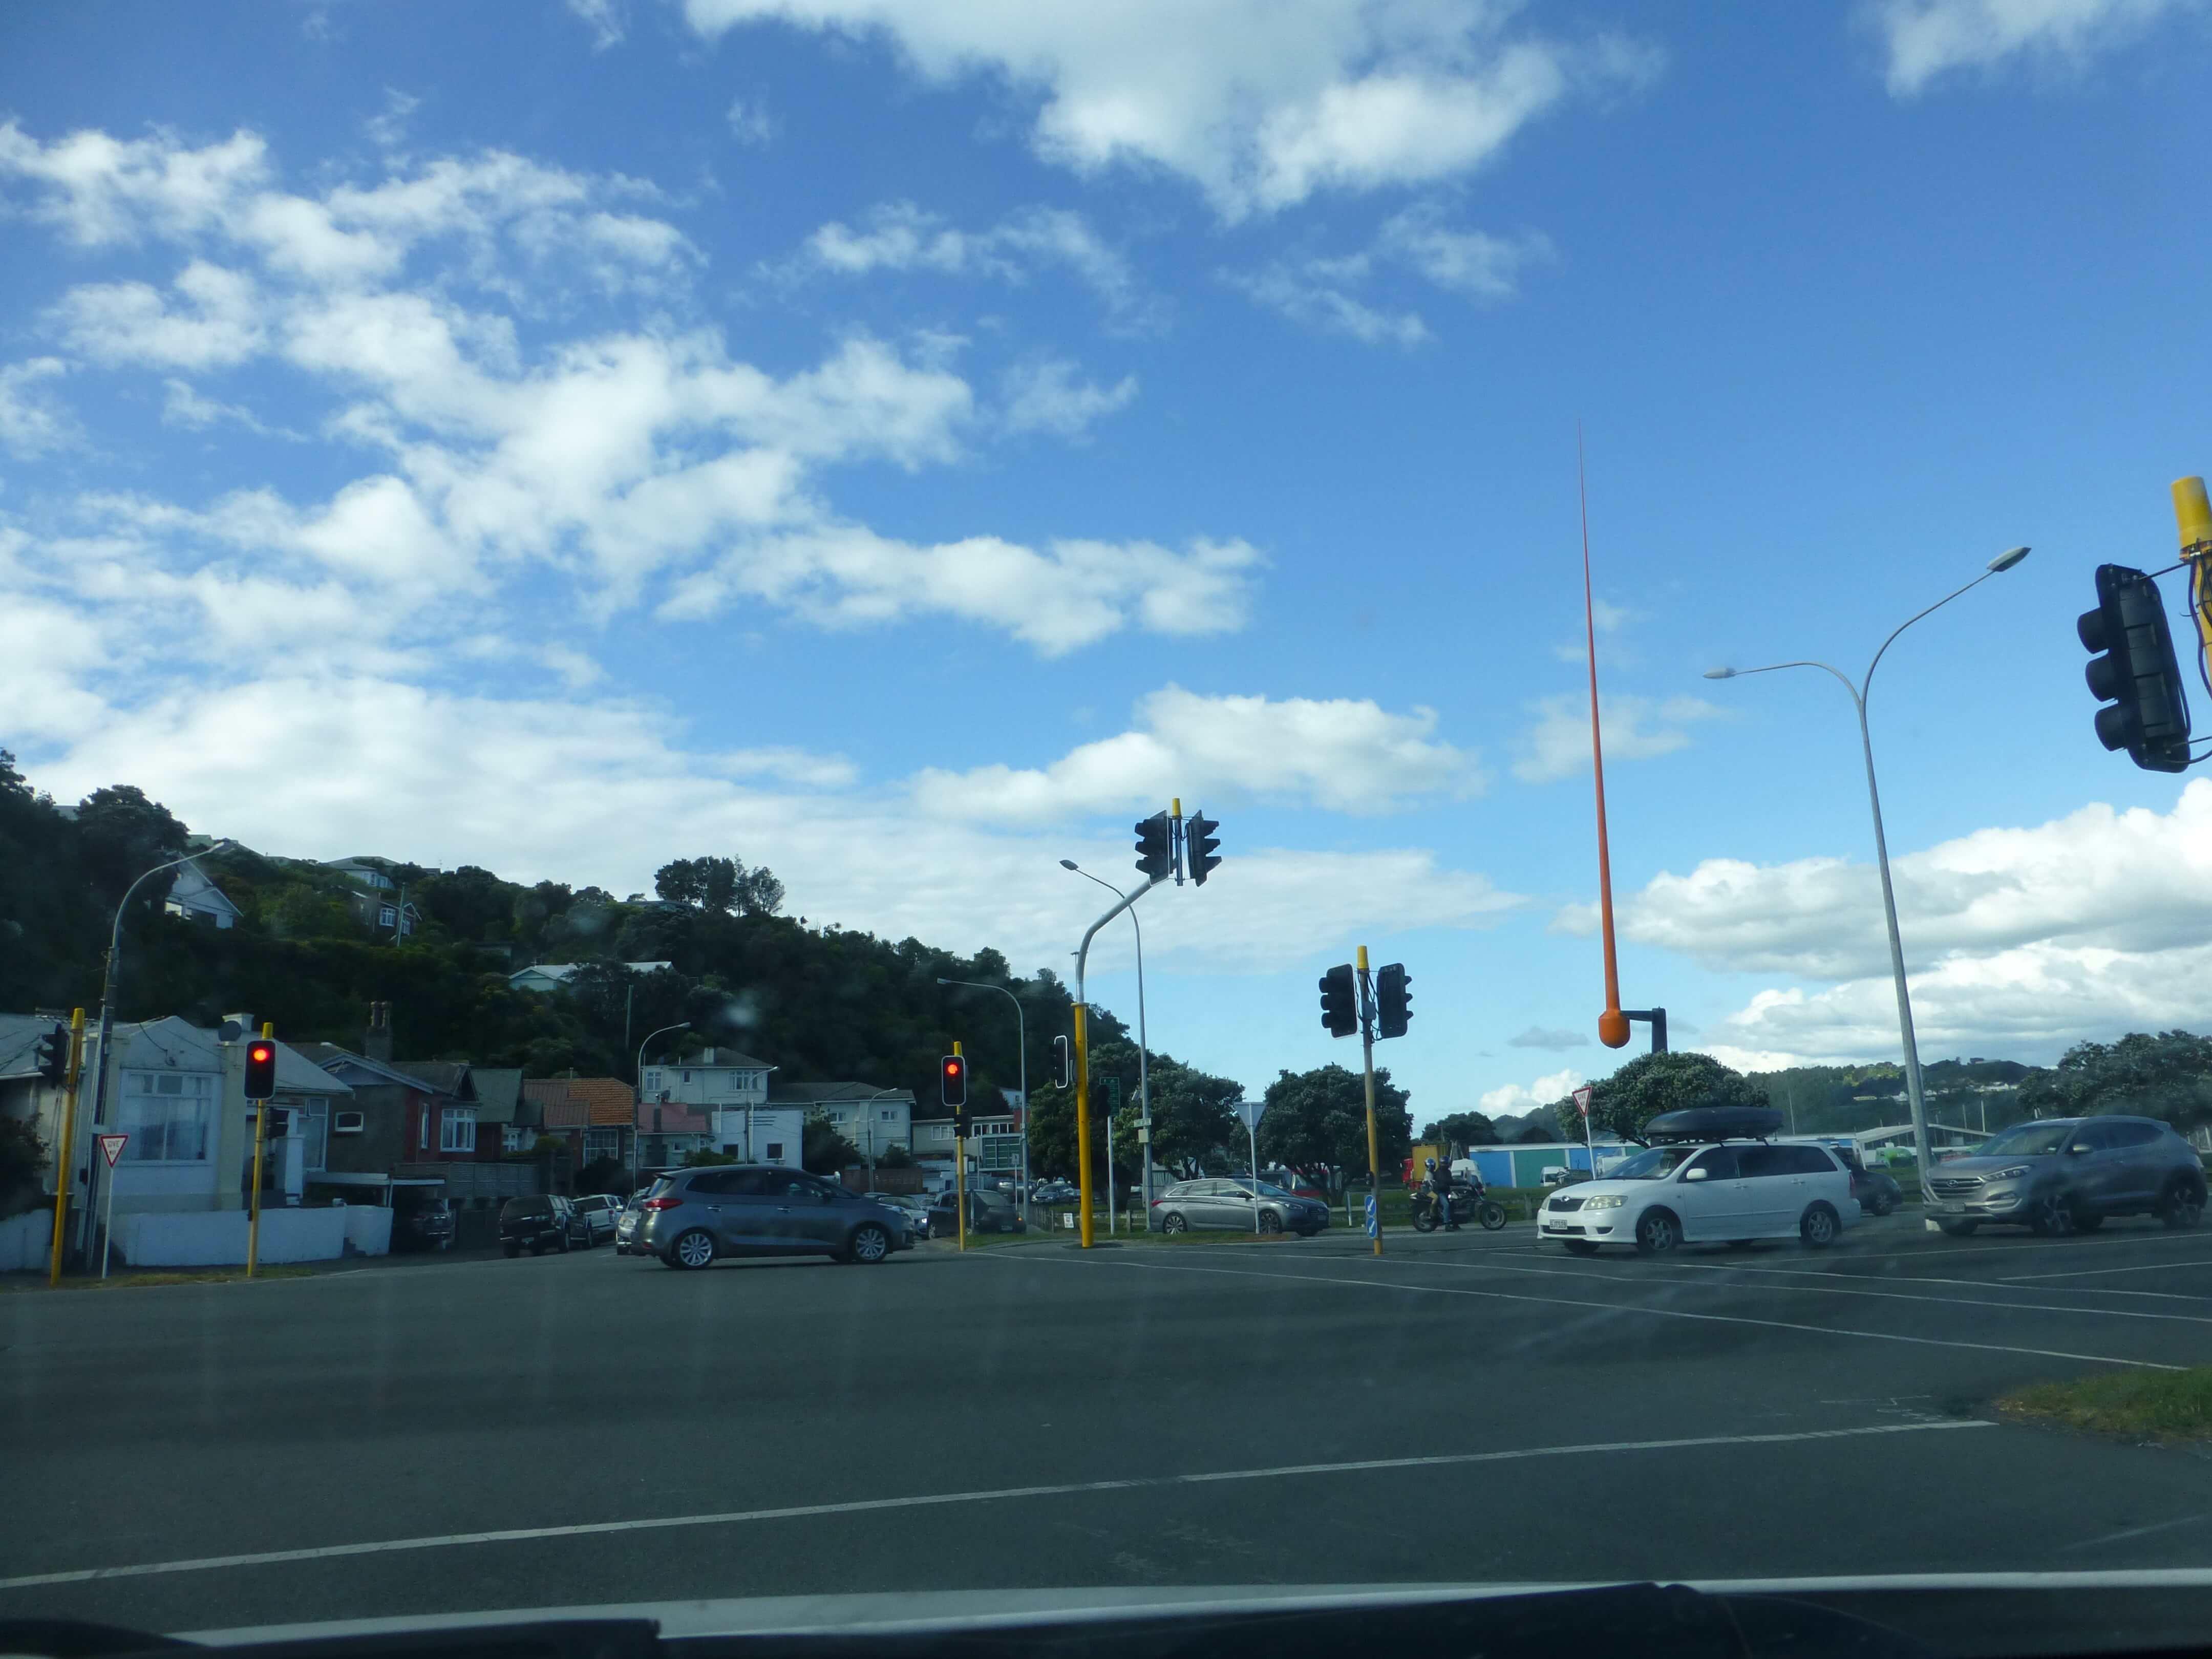 Windspiel in Wellington, Neuseeland, Weit-weg.reisen 18